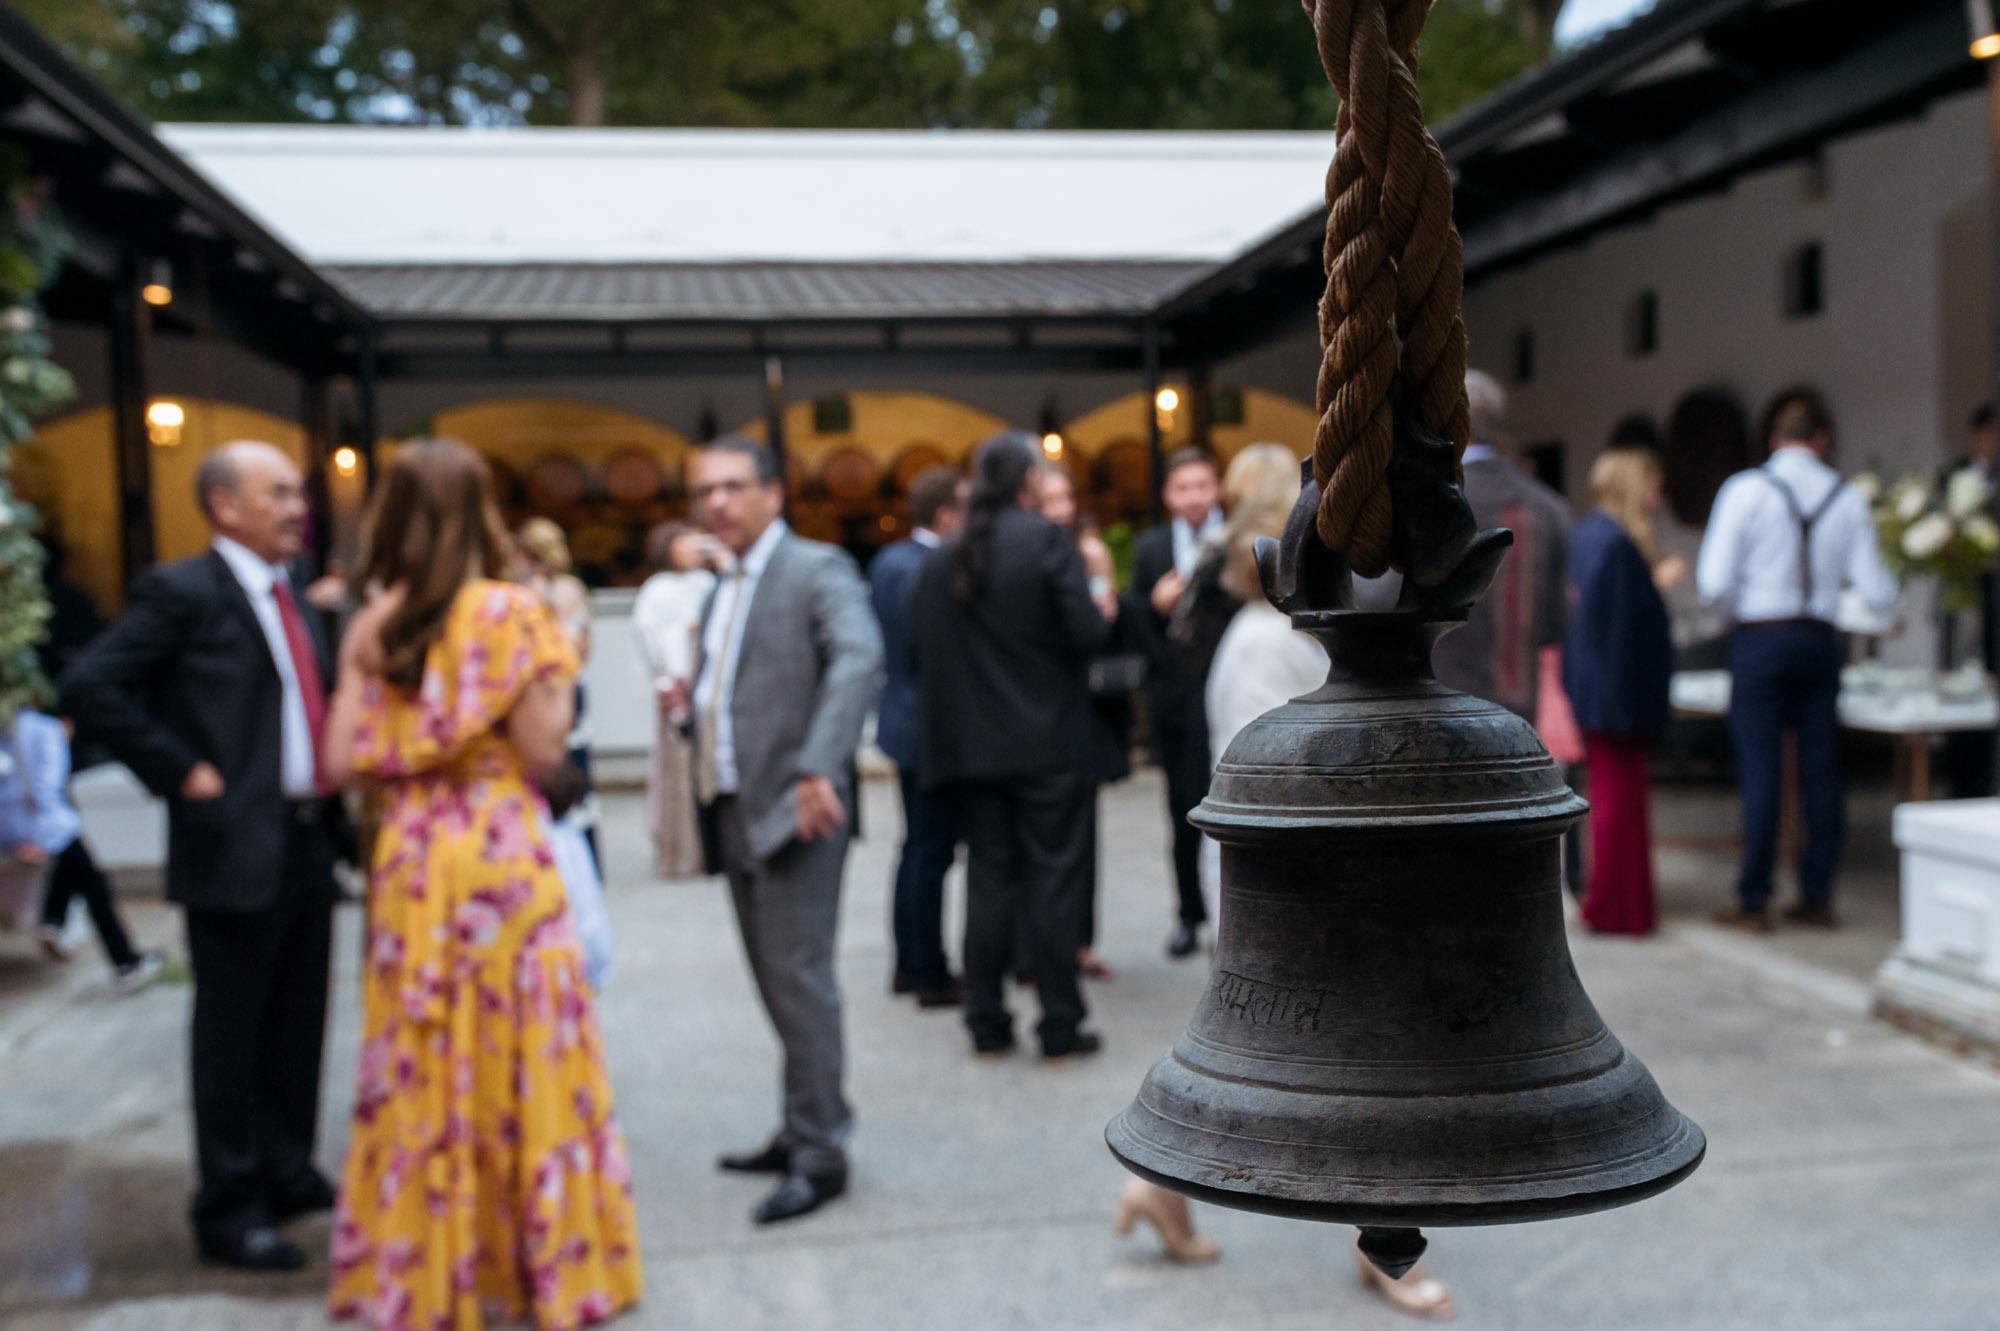 john-henry-cape-town-wedding-photographer-pre-drinks-001-2.jpg